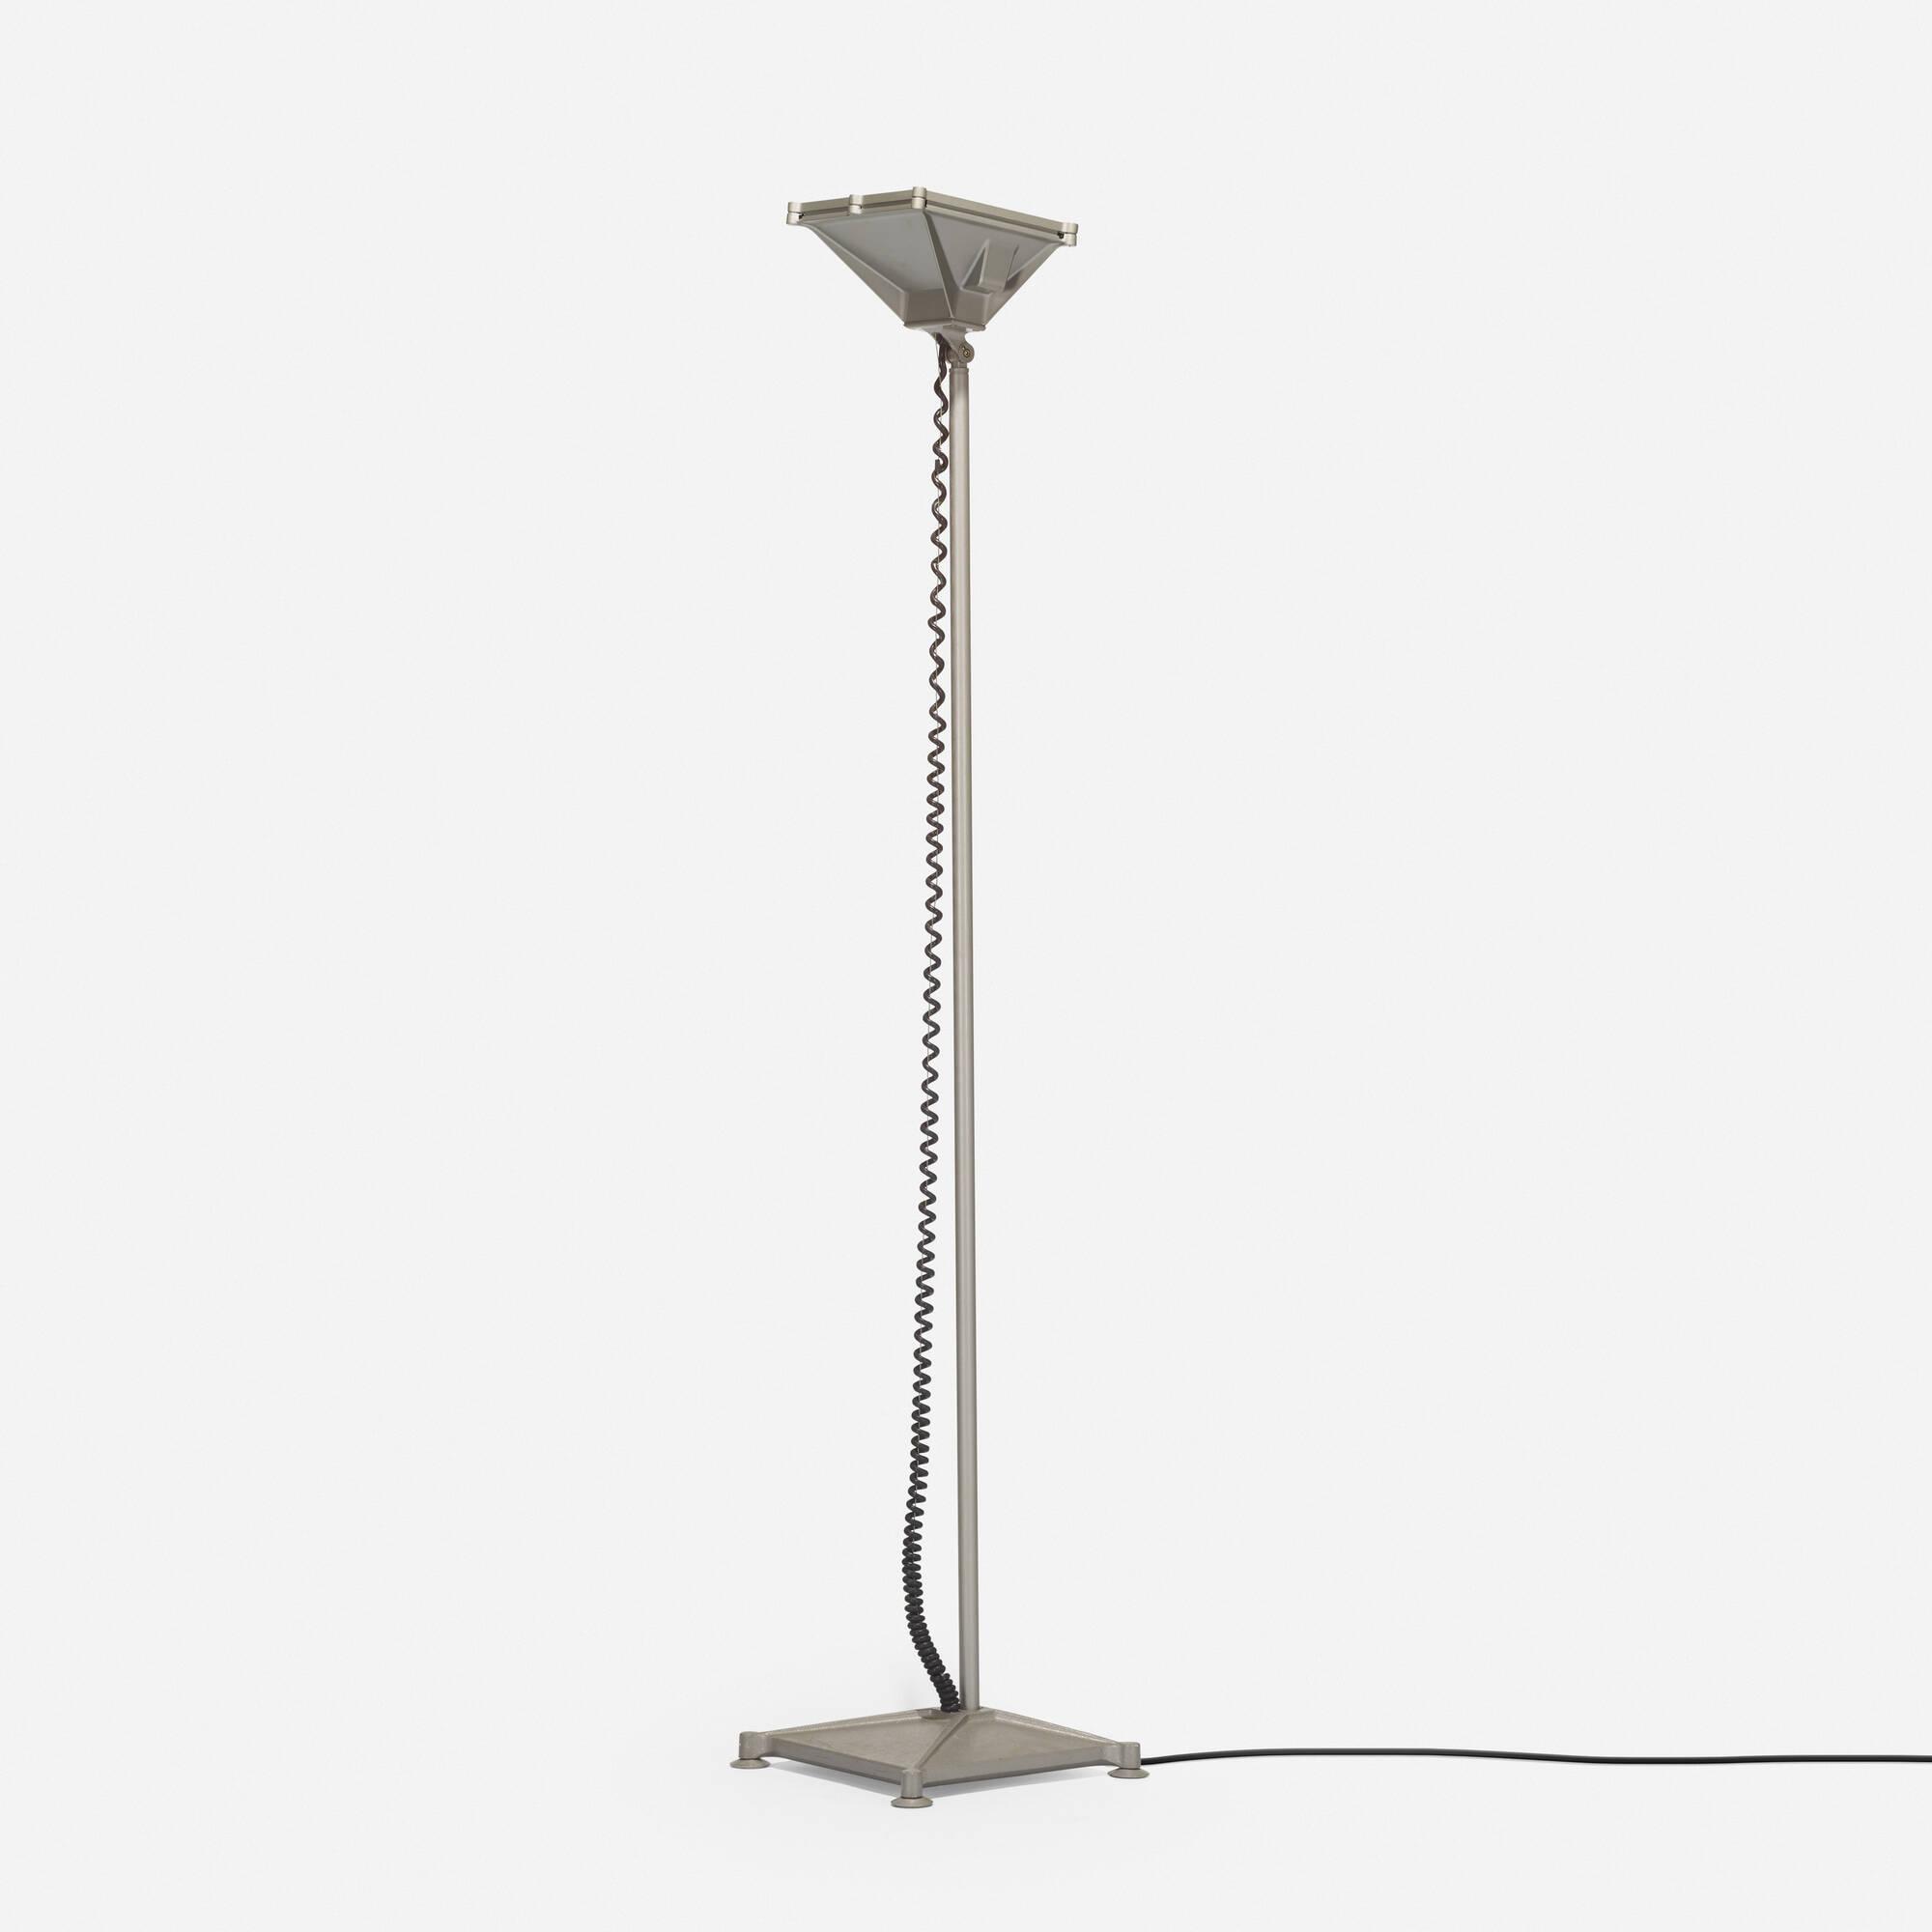 380: Renzo Piano / Lingotto floor lamp (1 of 2)